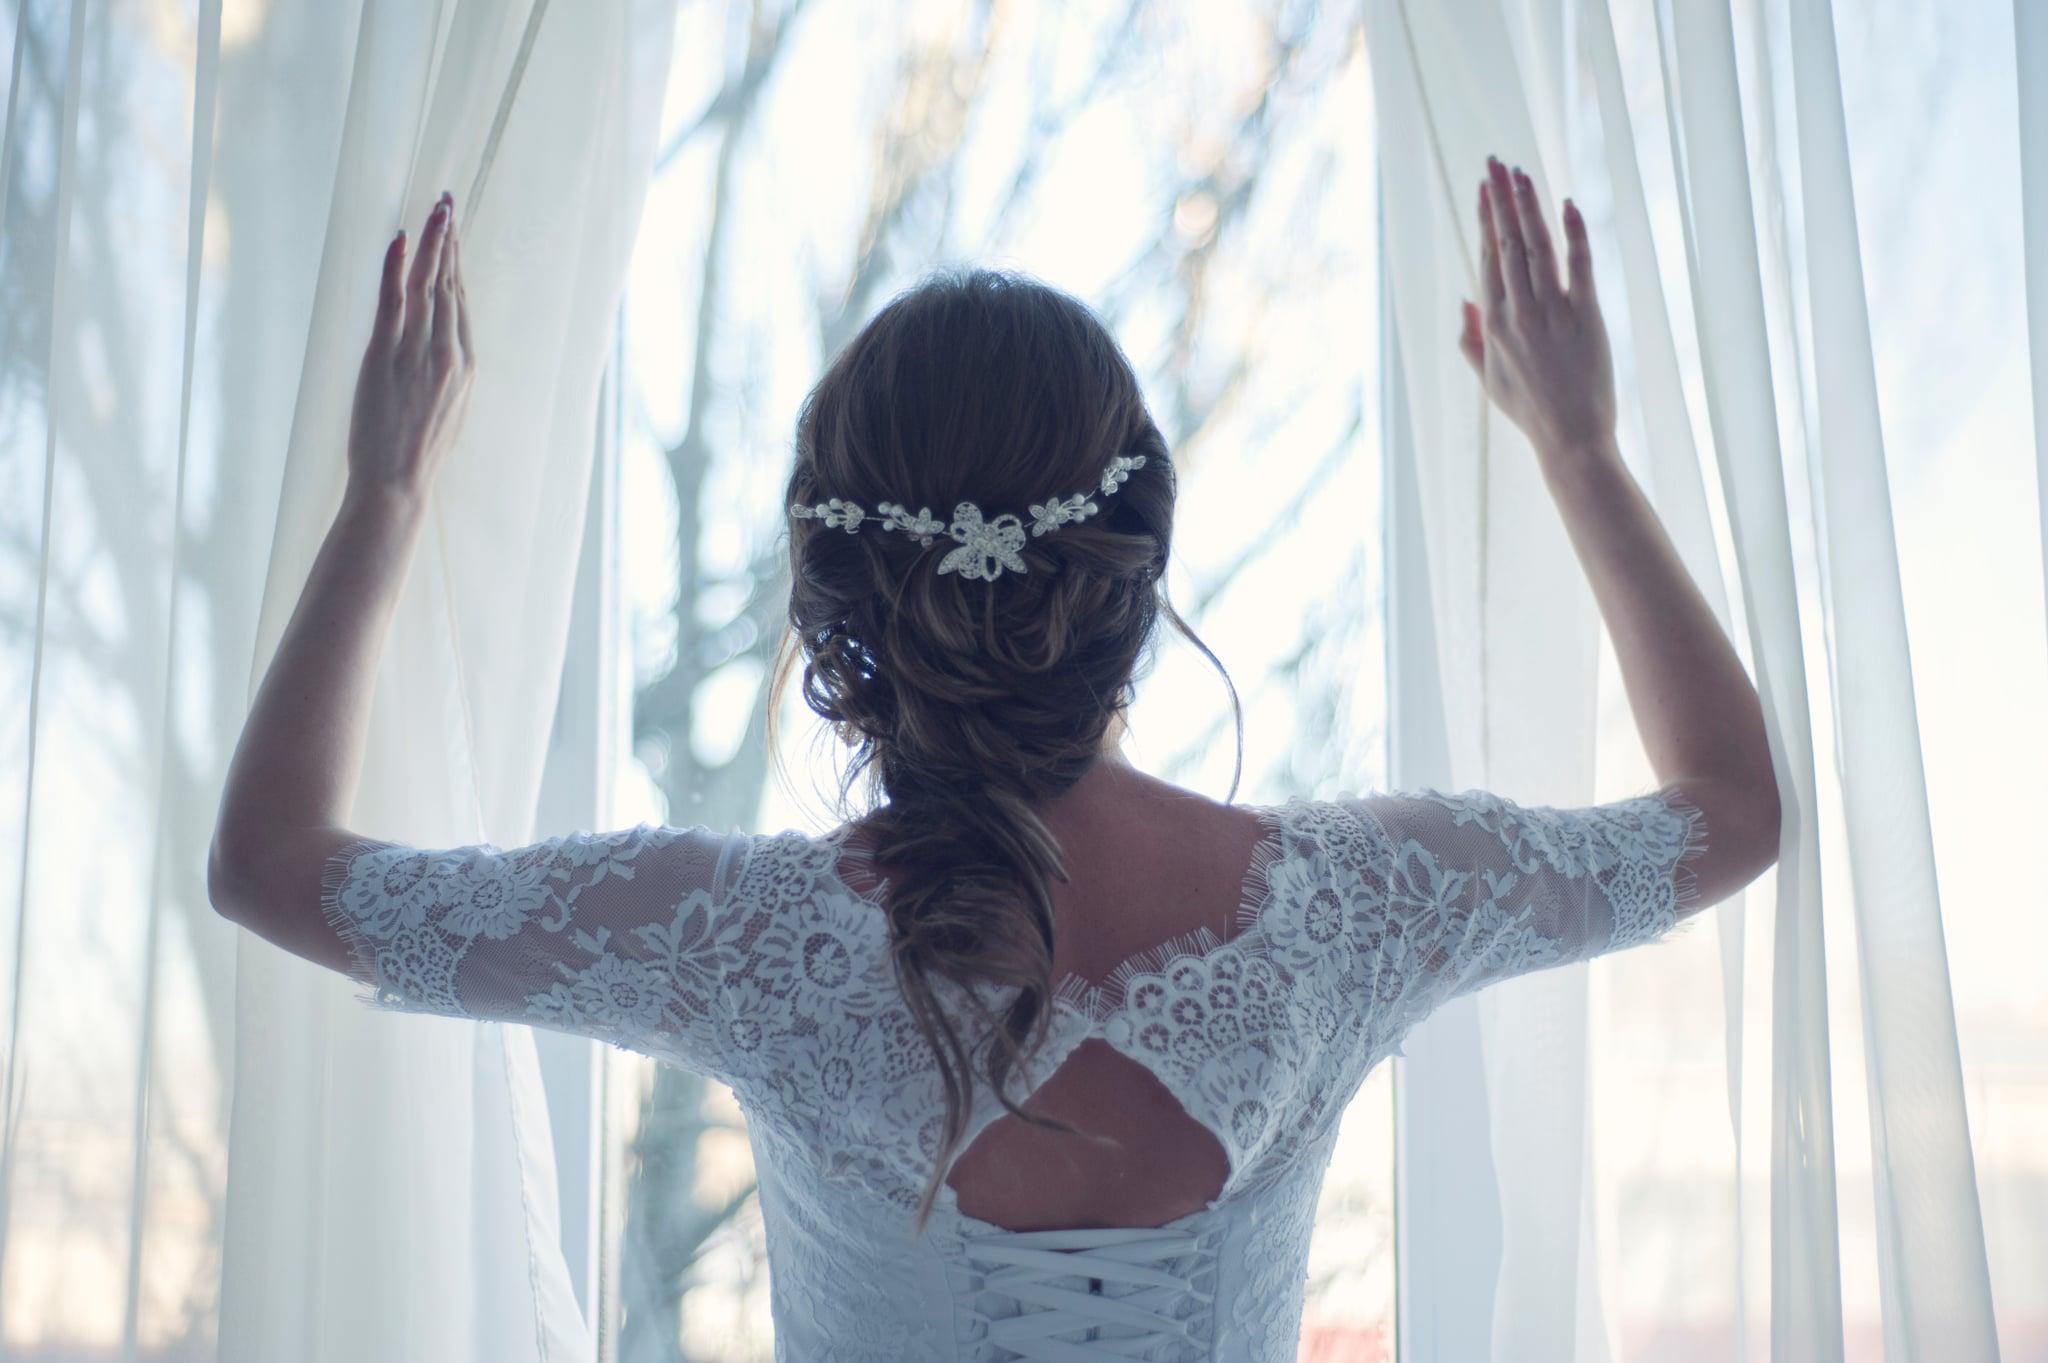 tmp_topPmc_3969442361f1d0ea_adult-bridal-bride-341372.jpg